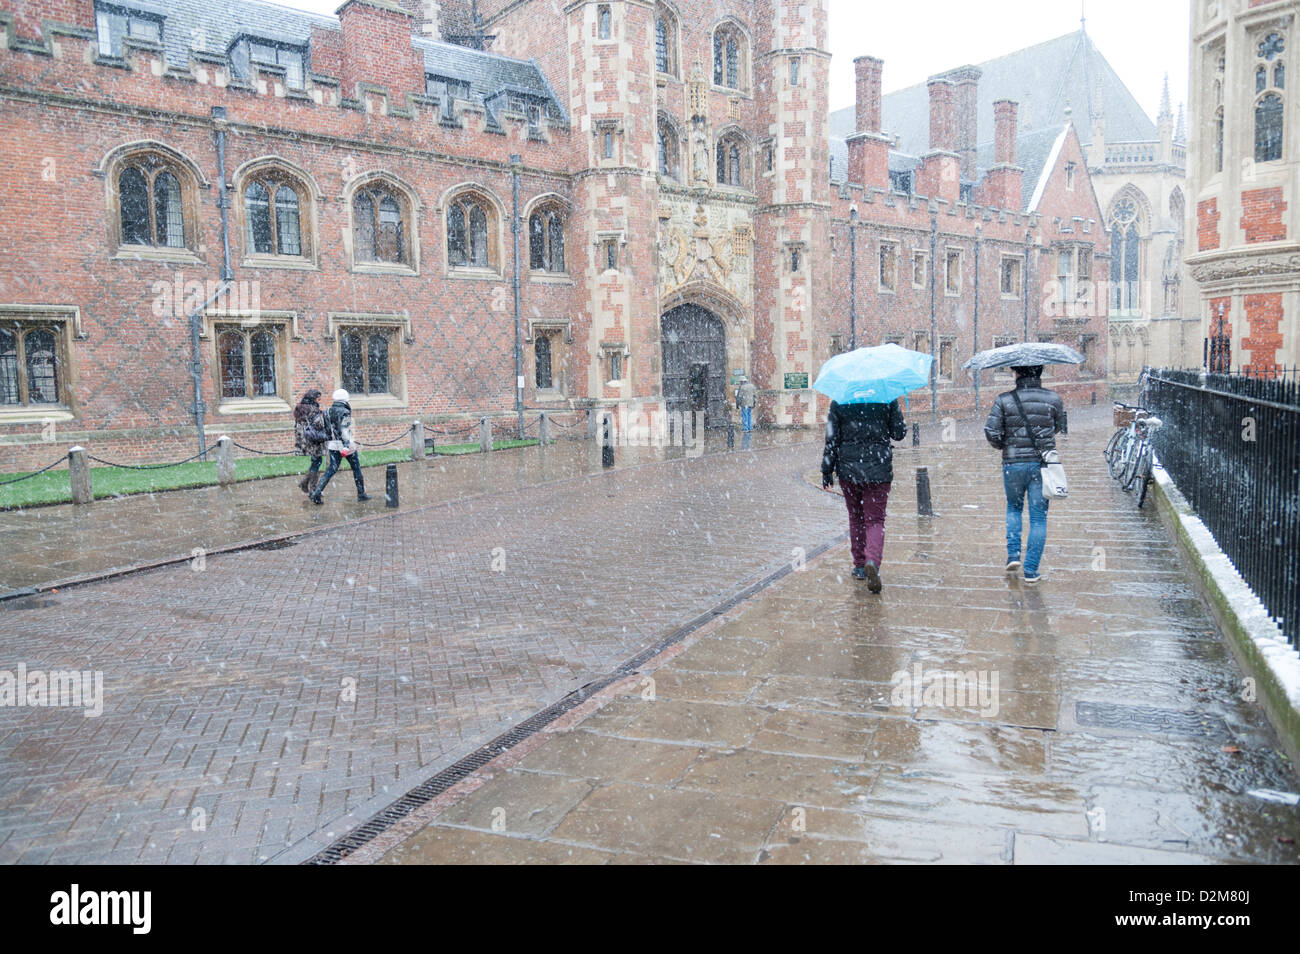 People walking in snowy bad weather in St John's Street Cambridge UK carrying umbrellas near St John's College - Stock Image